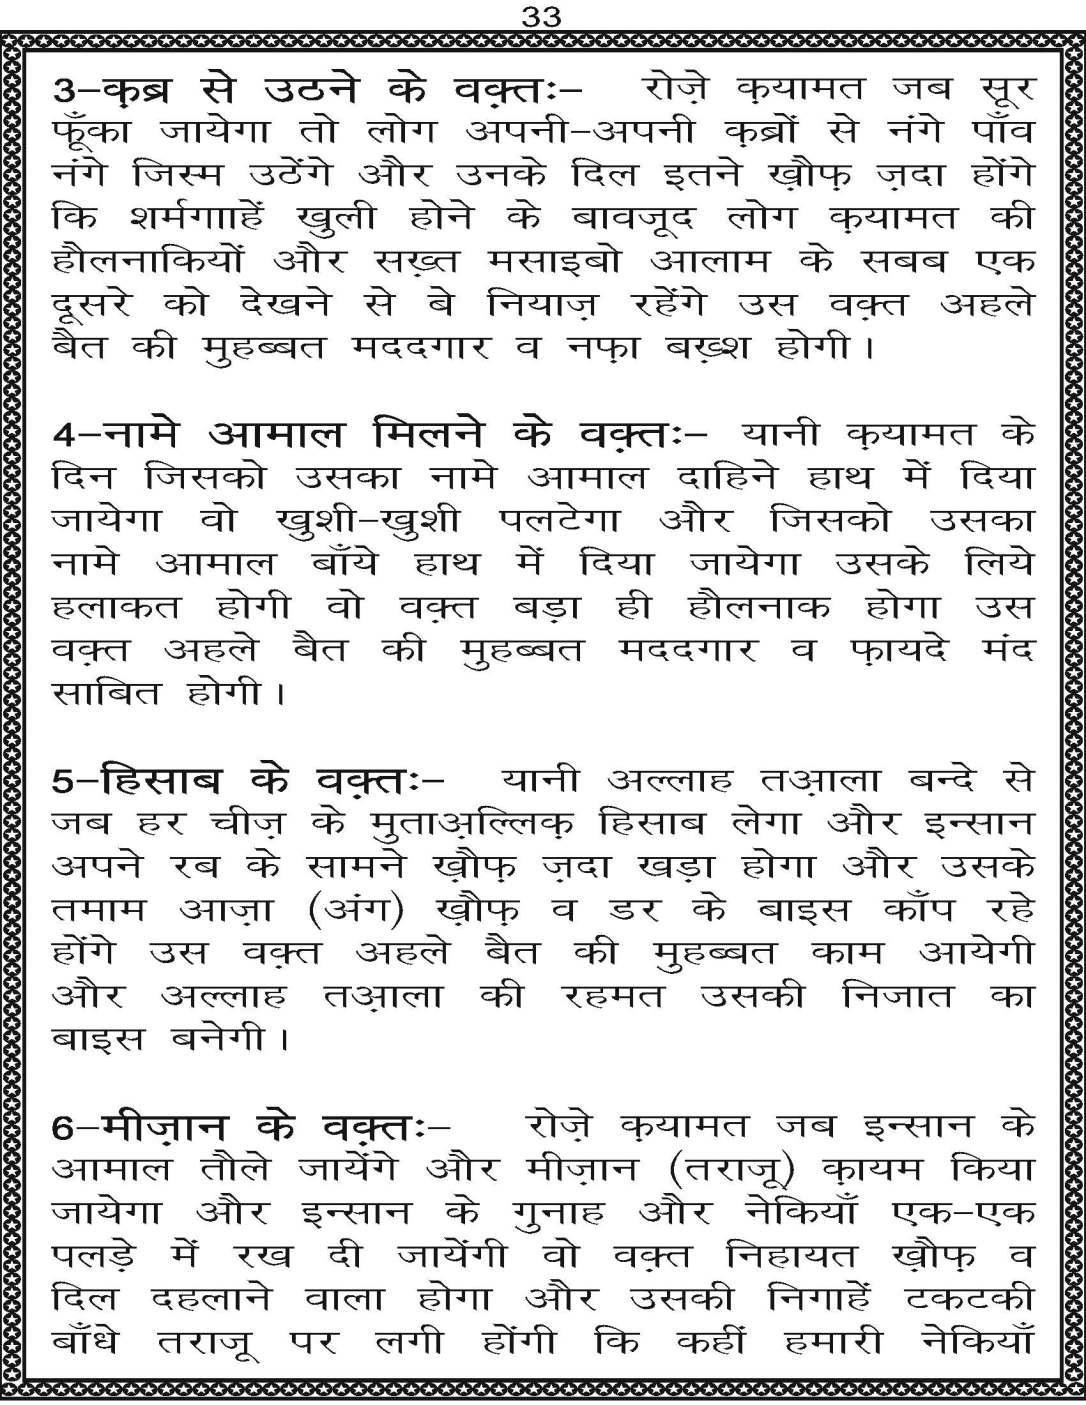 AzmateTaziyadari_Page_033